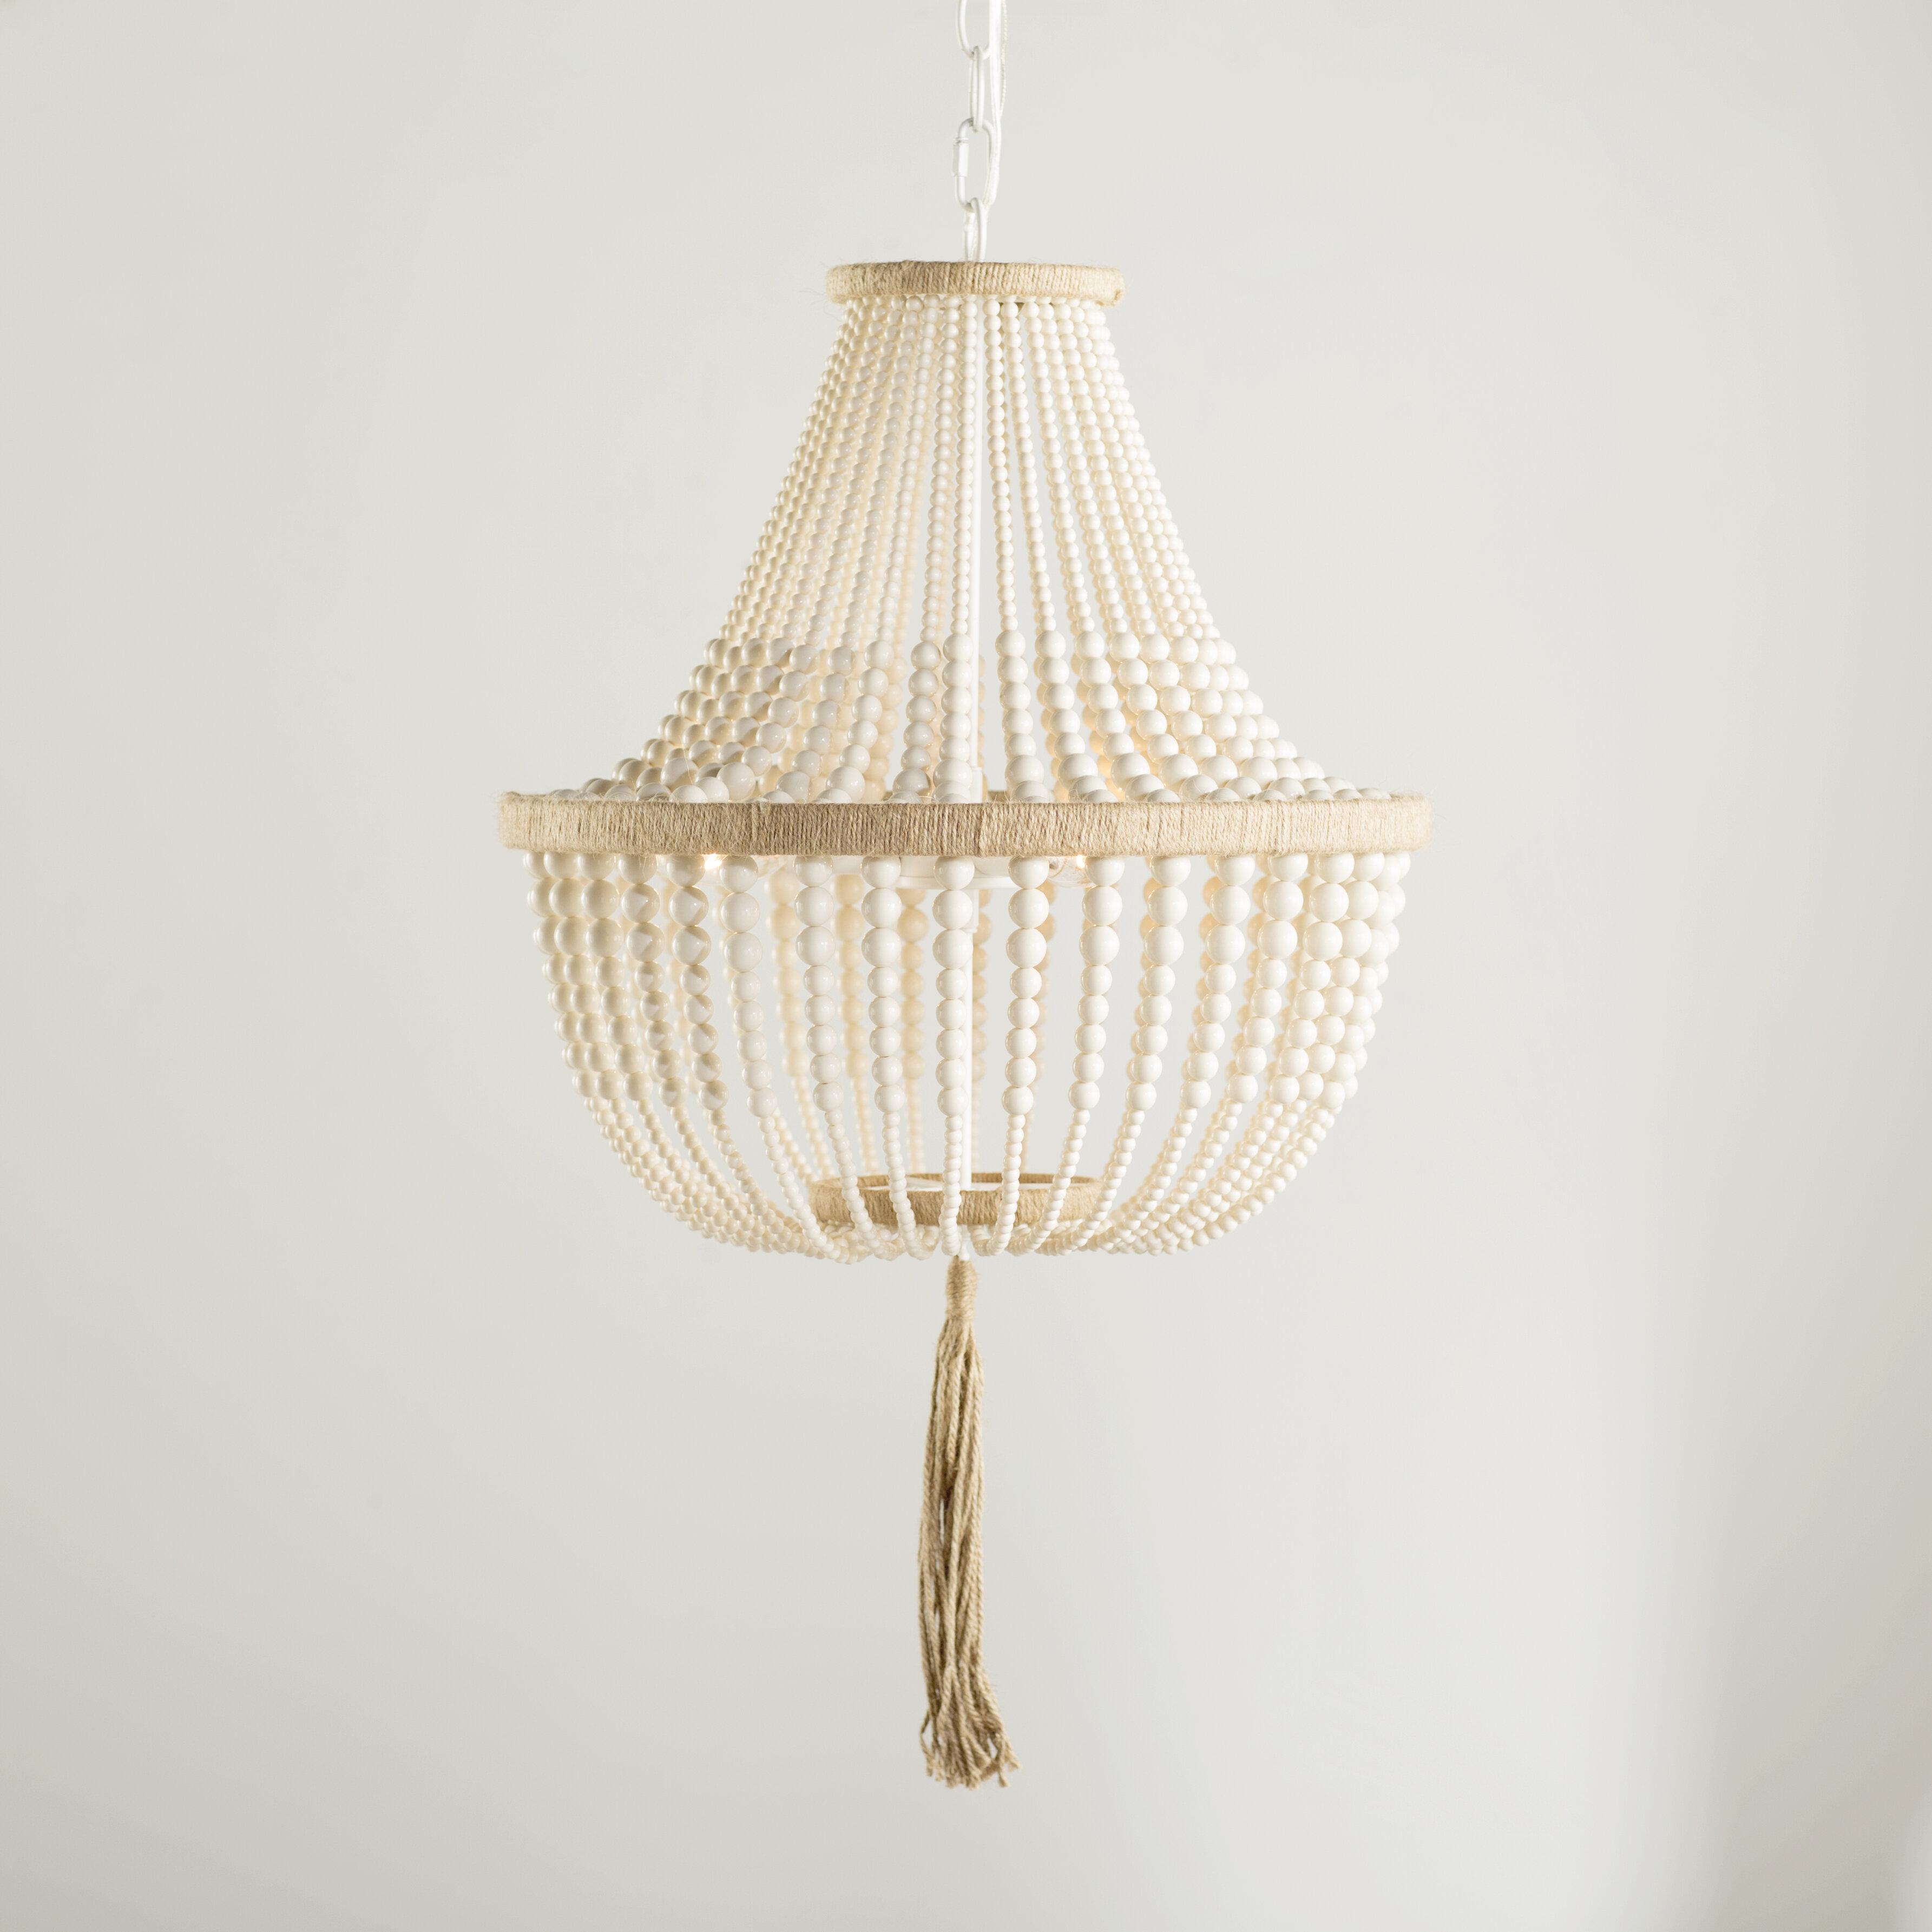 Lyon 3 light empire chandelier